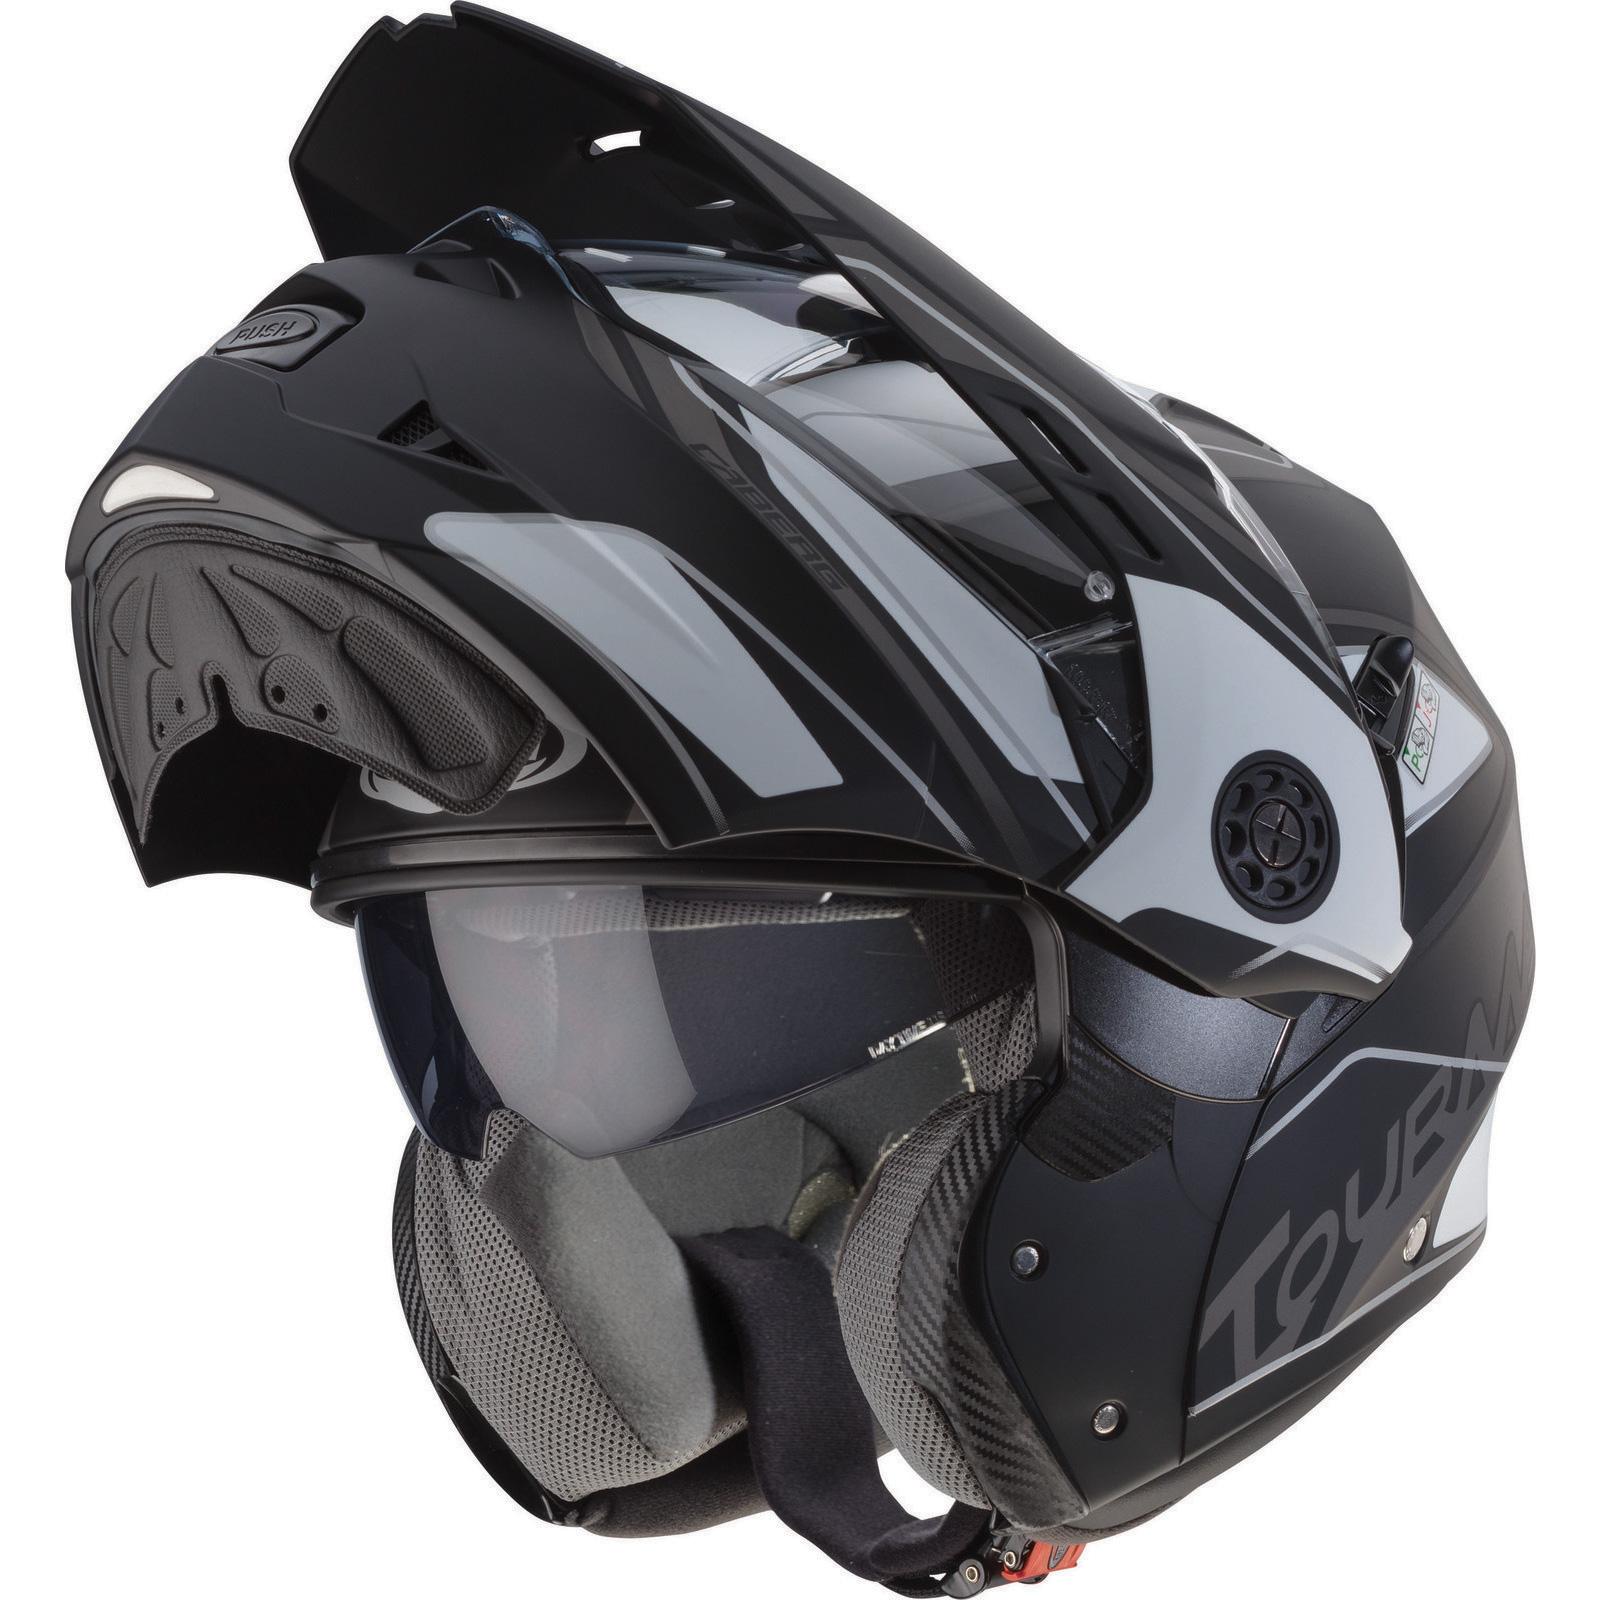 Caberg-Tourmax-Marathon-Flip-Front-Motorcycle-Motorbike-Helmet-amp-Visor-Crash